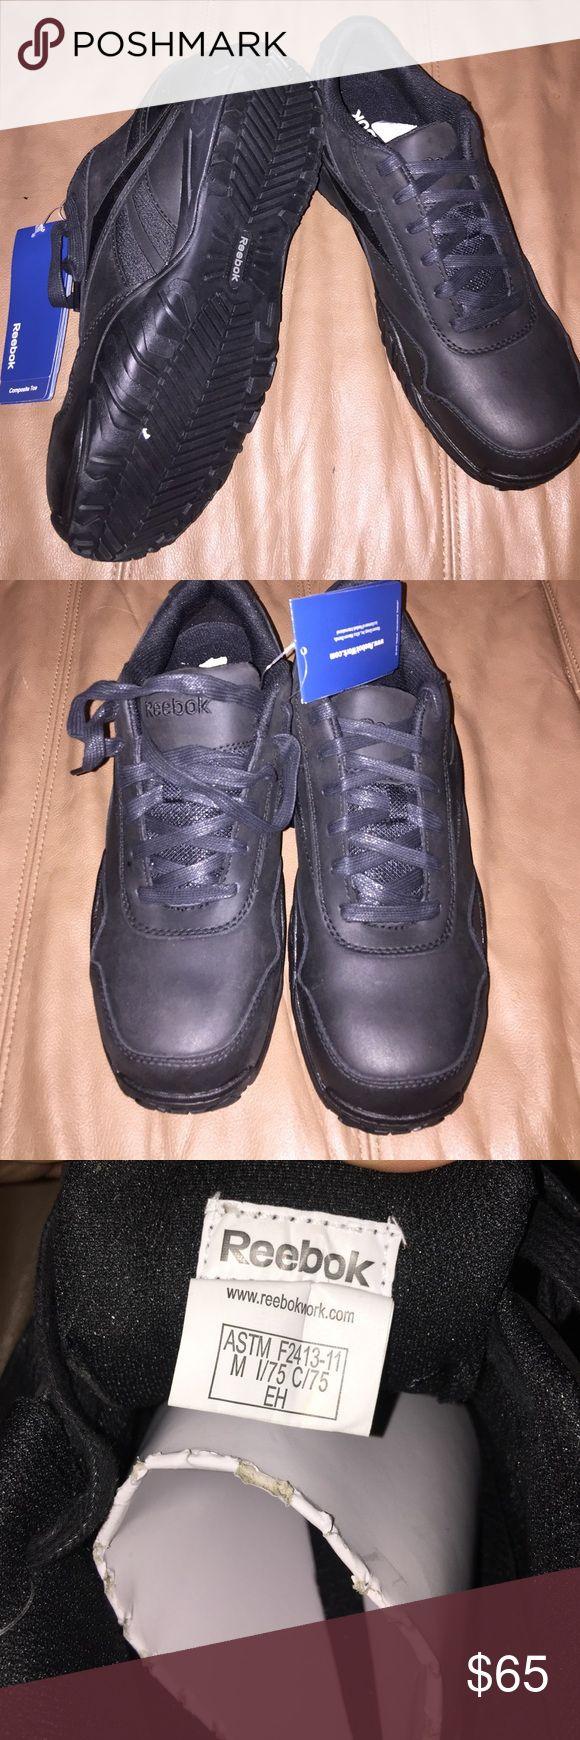 Men's Reebok Steel toe work Tennis size 10 New Reebok men's size 10 steel toe black tennis work shoes Reebok Shoes Athletic Shoes